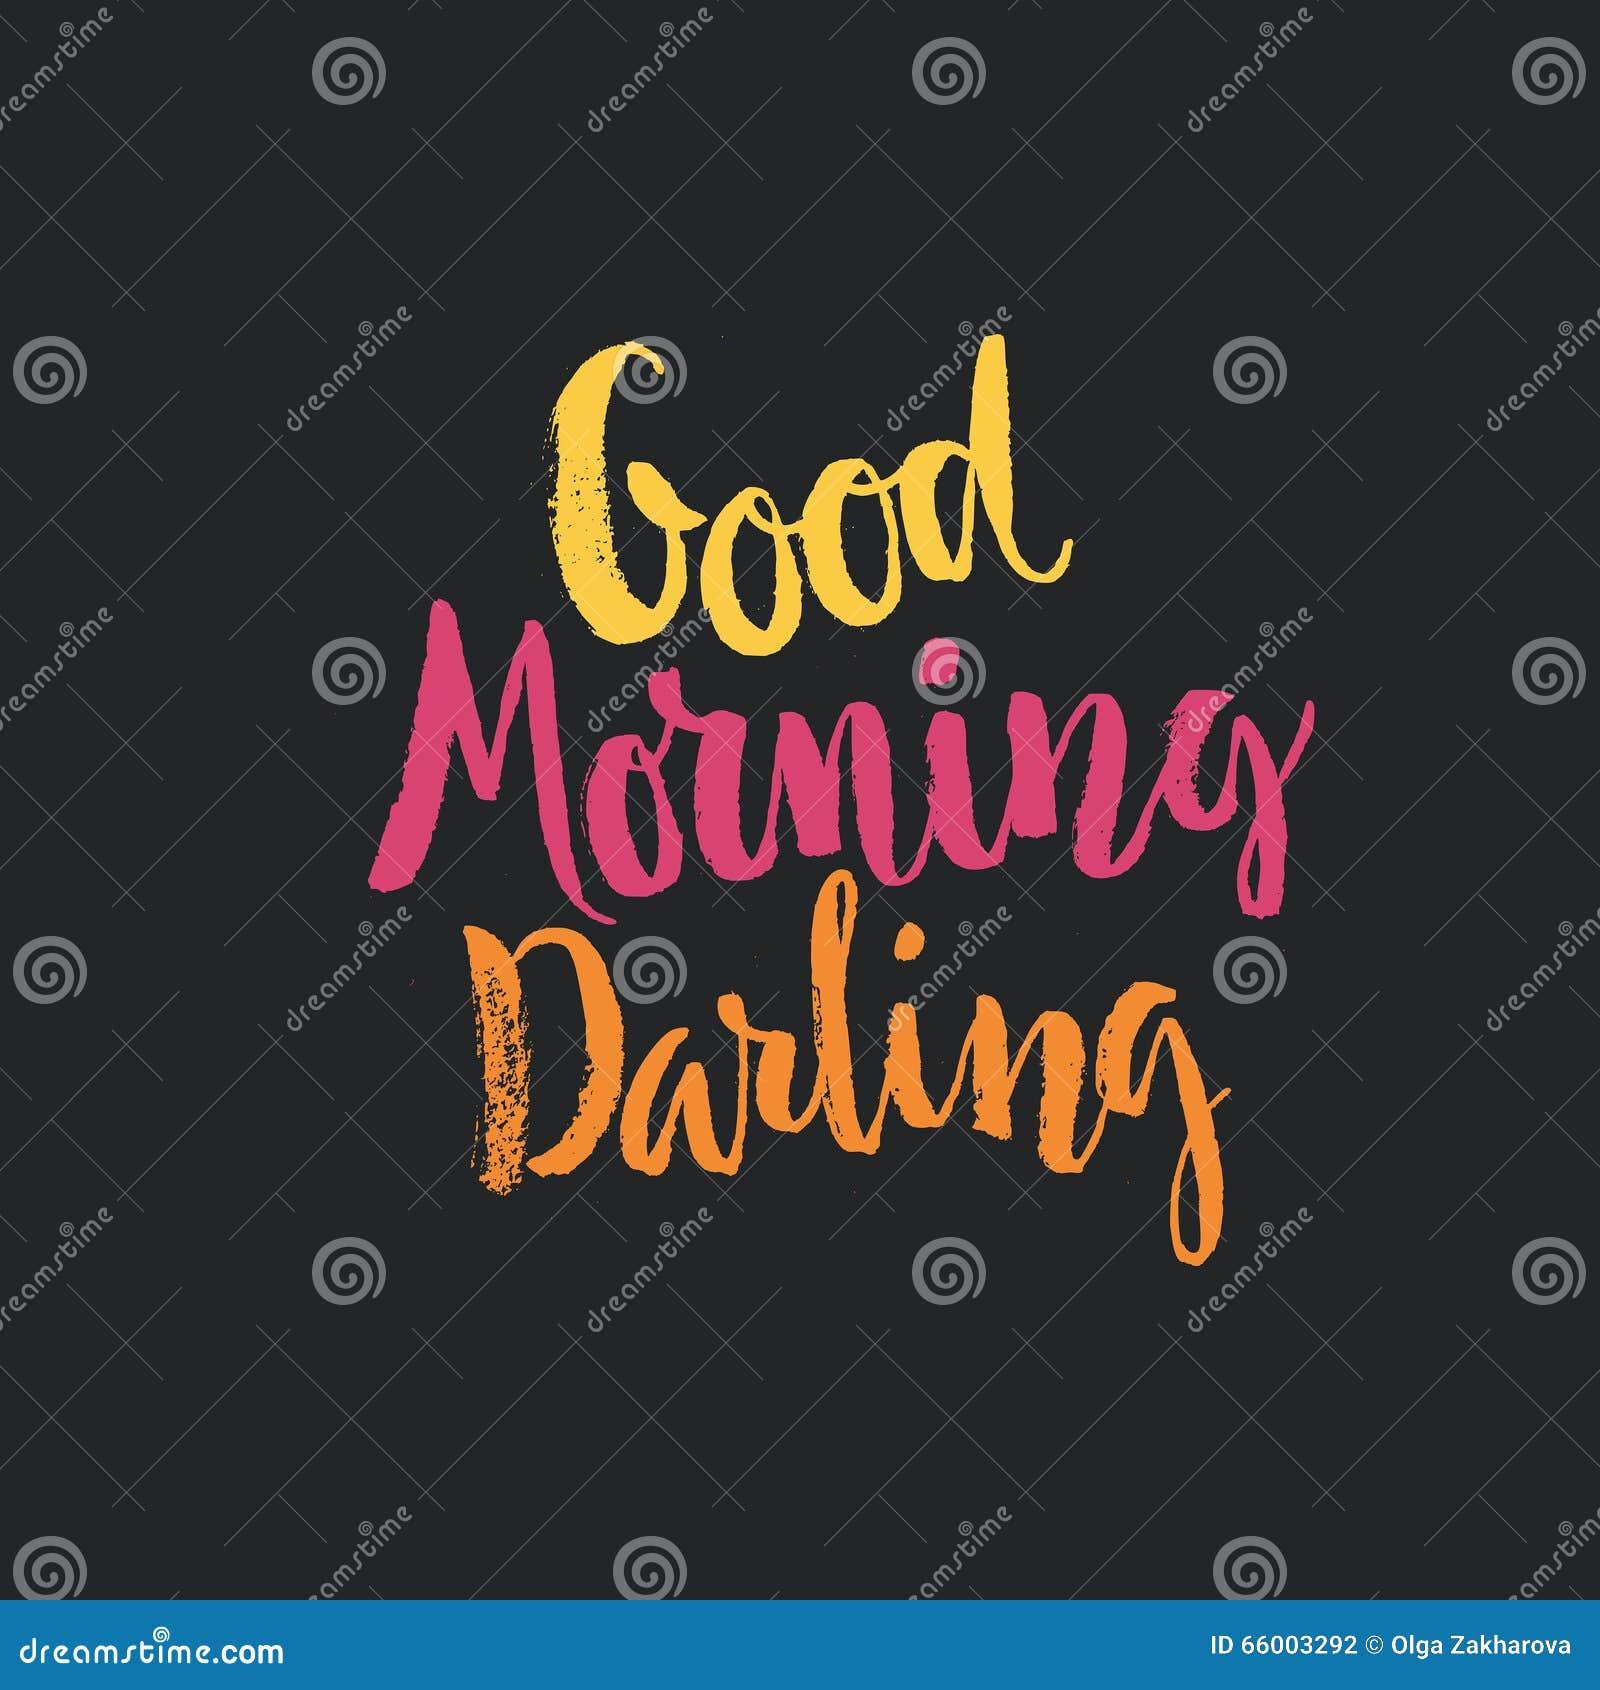 Good Morning Lettering Stock Vector Illustration Of Banner 66003292